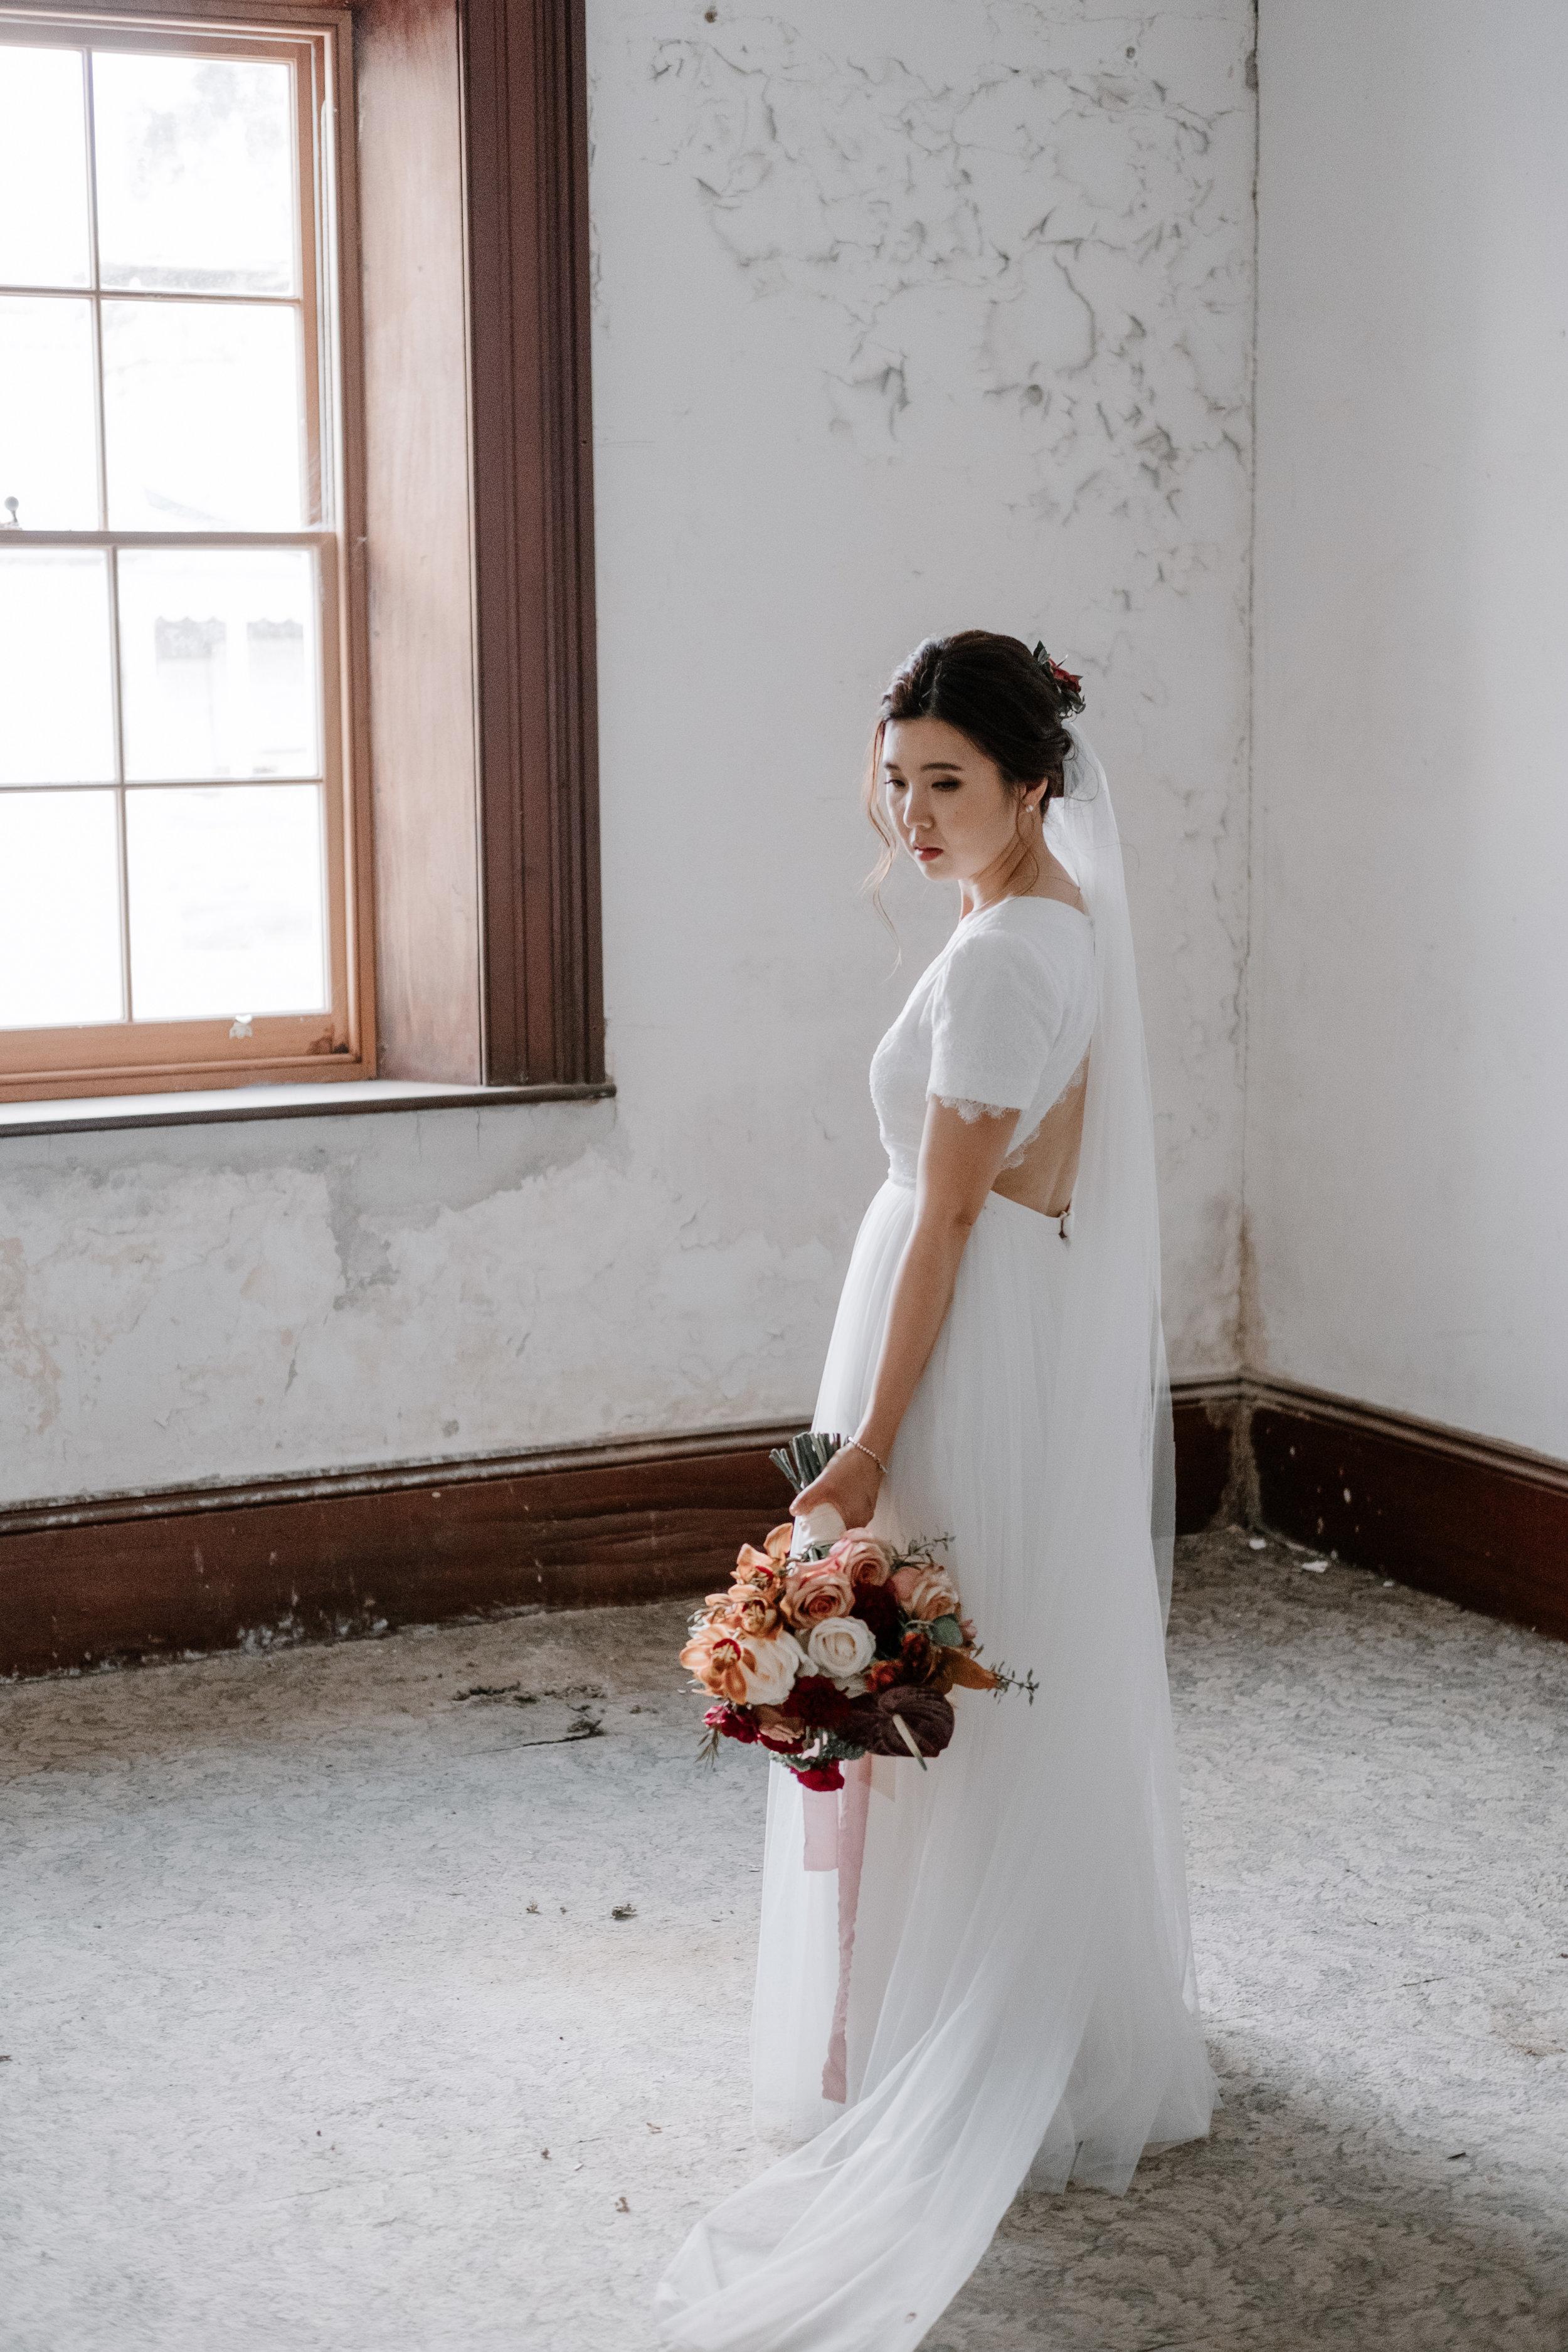 Tiffany Custom Made Wedding Gown with Veil